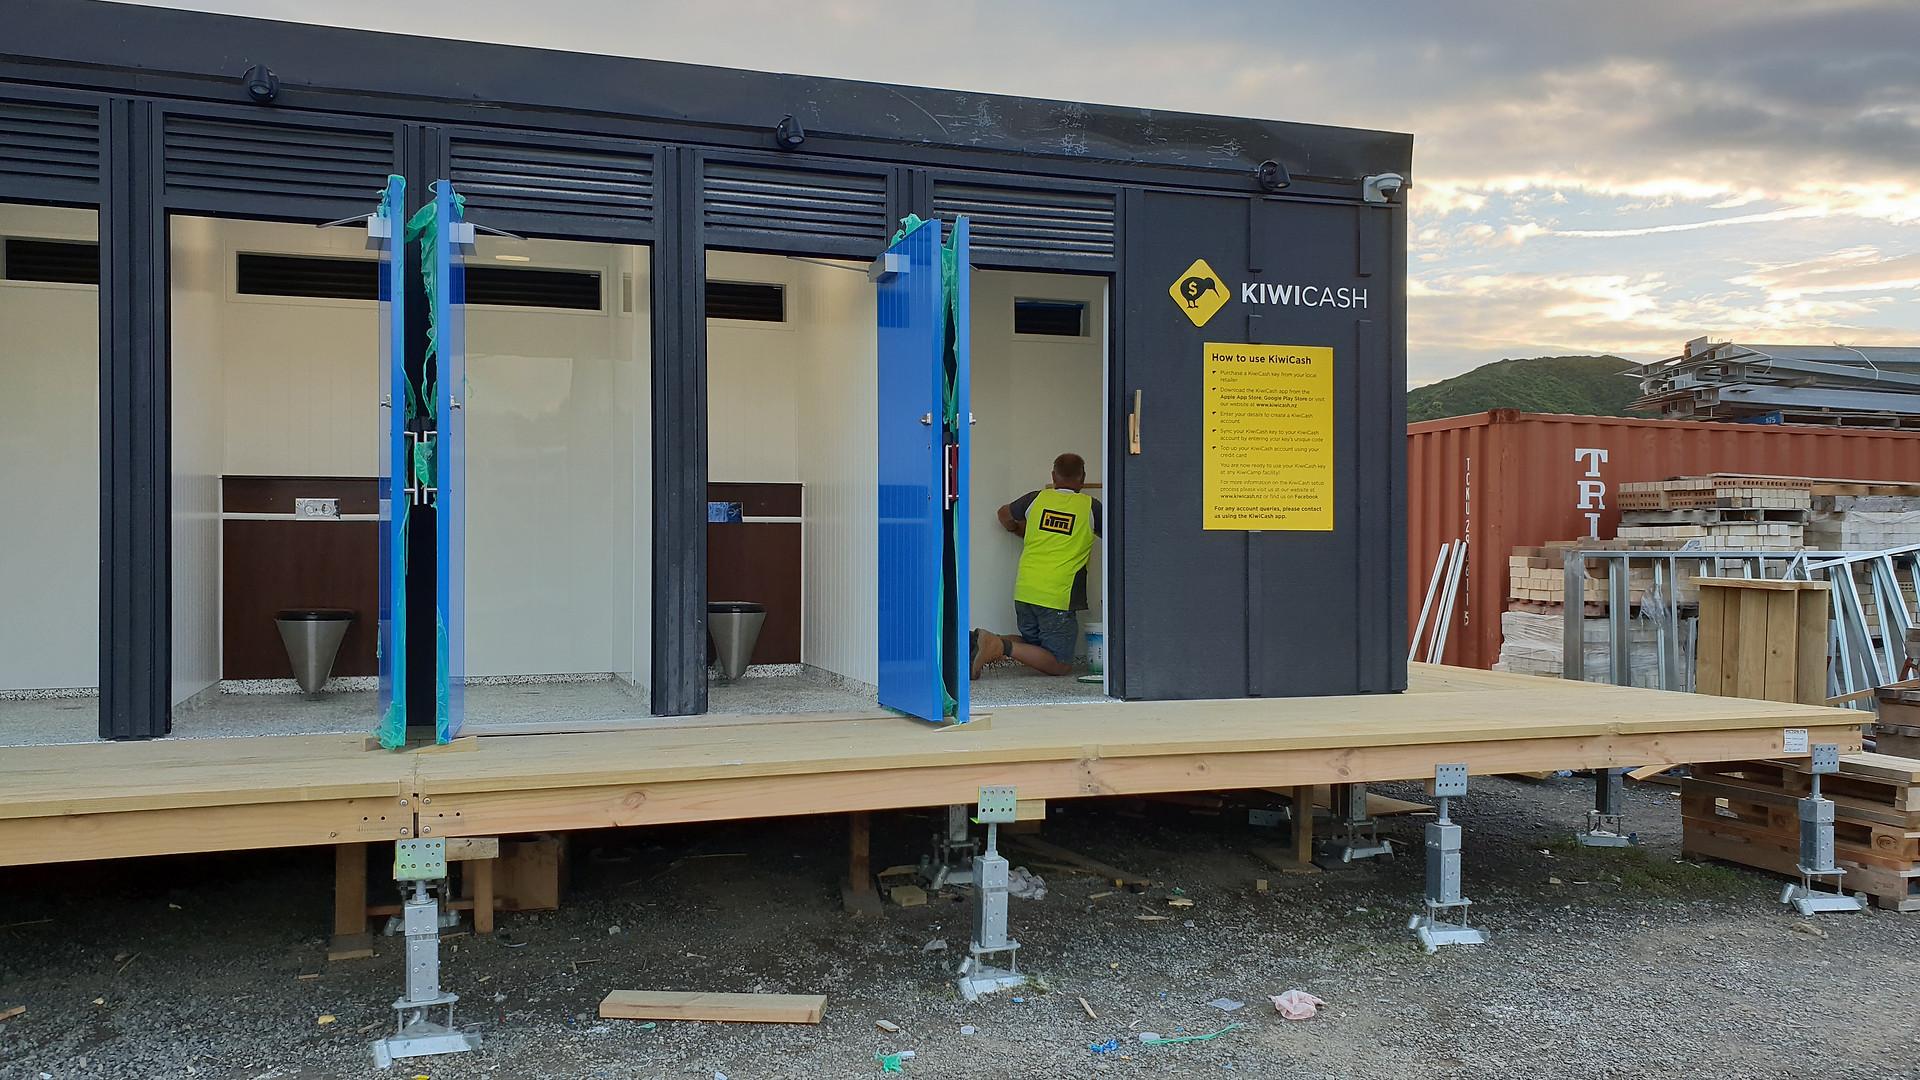 KiwiCamp Toilet Block